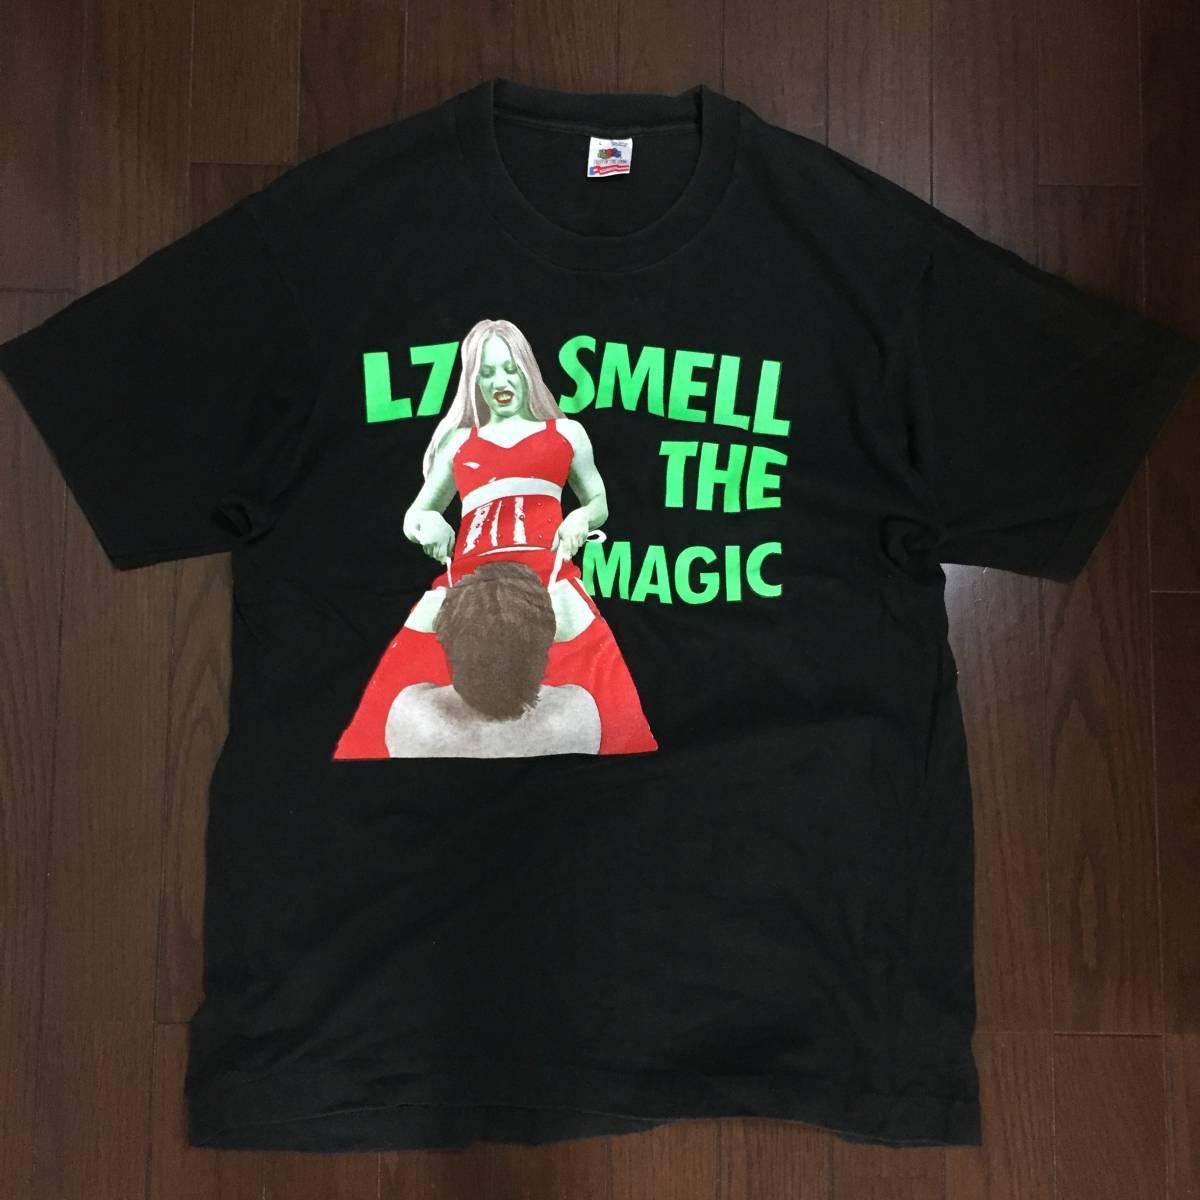 L7 smell the magic 古着Tシャツ(バンド グランジ オルタナ ヴィンテージ sub pop)